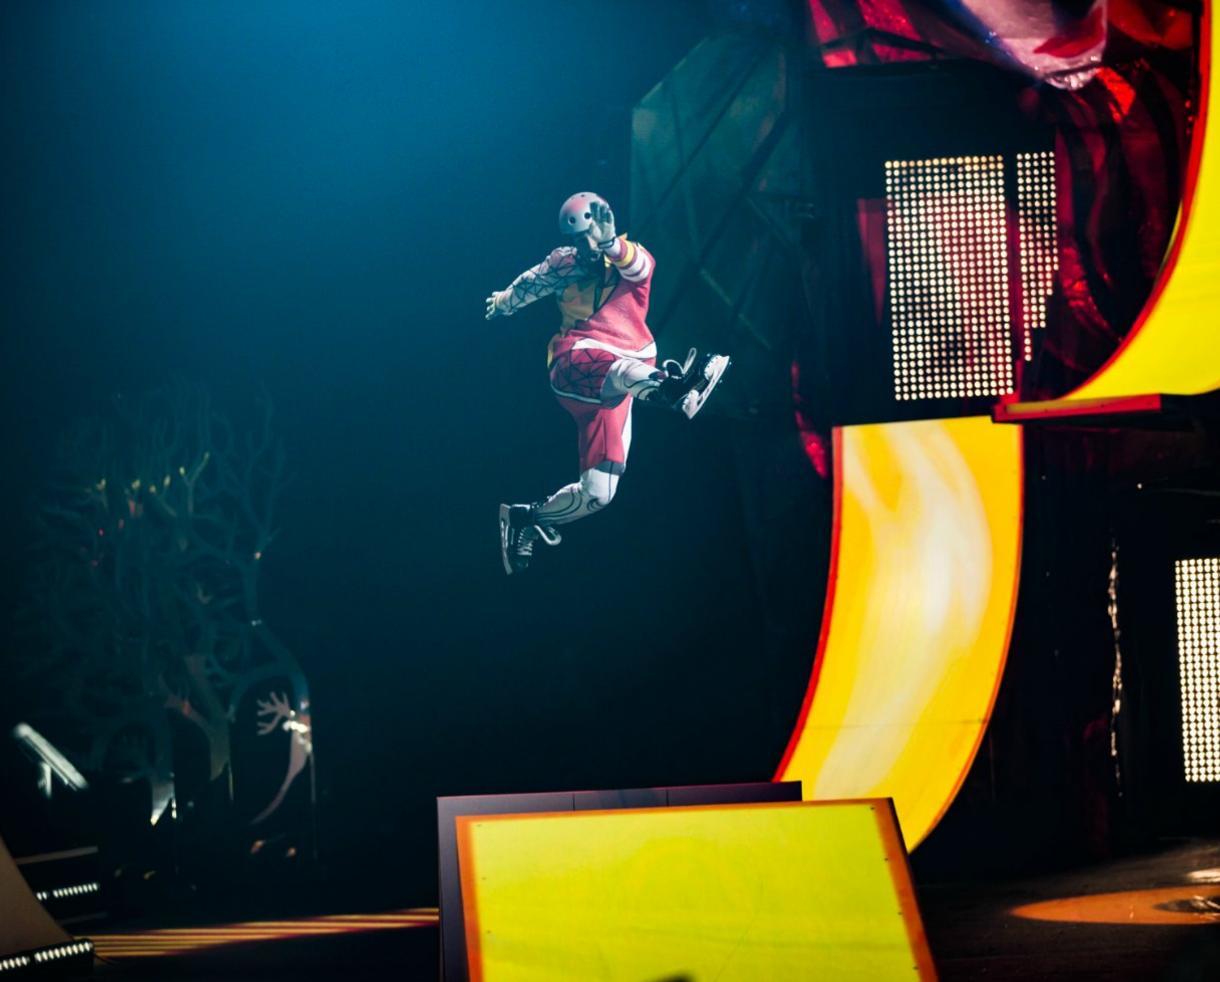 Cirque du Soleil's Crystal at Royal Farms Arena